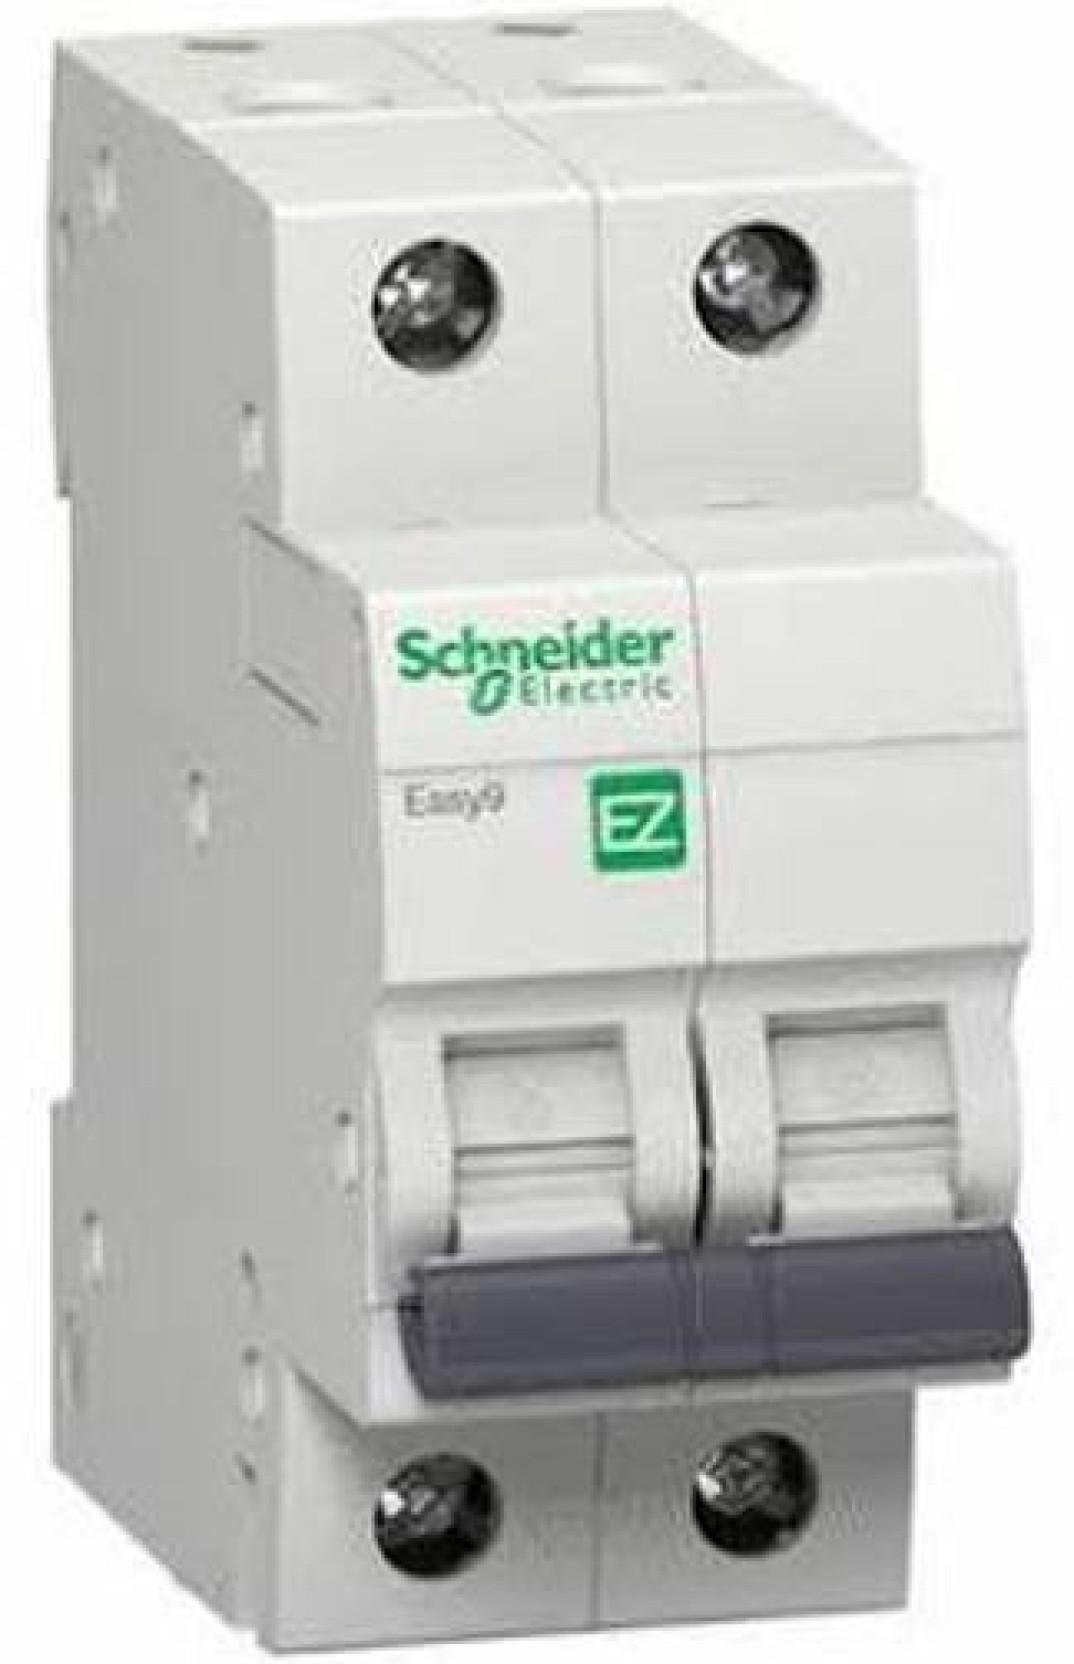 Schneider Easy9 MCB Series EZ Single Pole Type B 32A 40A